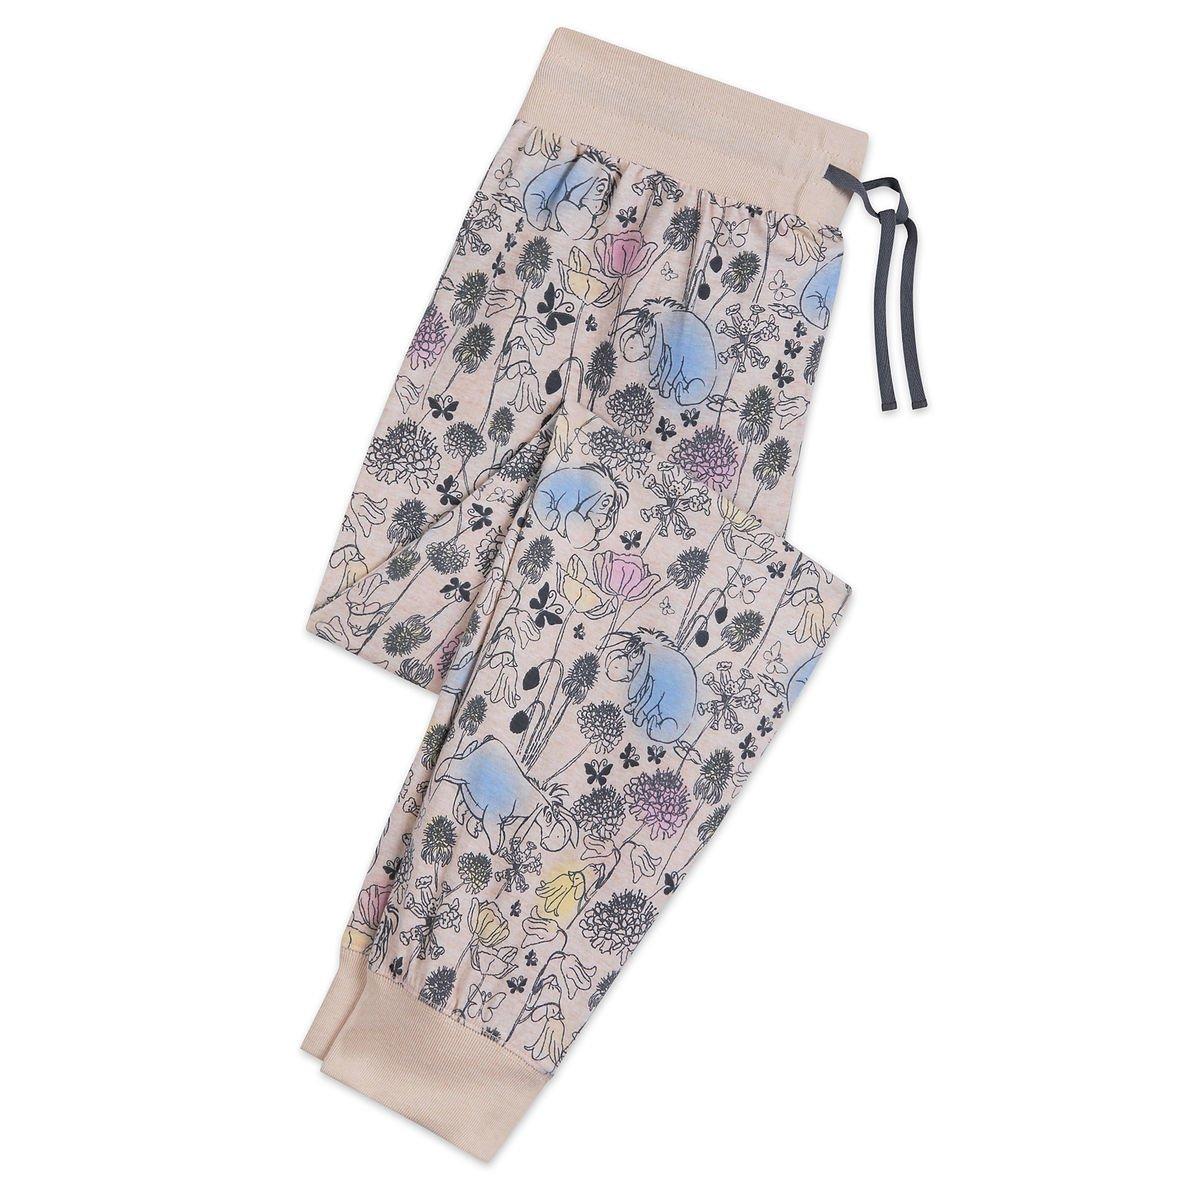 Disney Store Eeyore Ladies Lounge Pants Sleepwear Size XS 2018